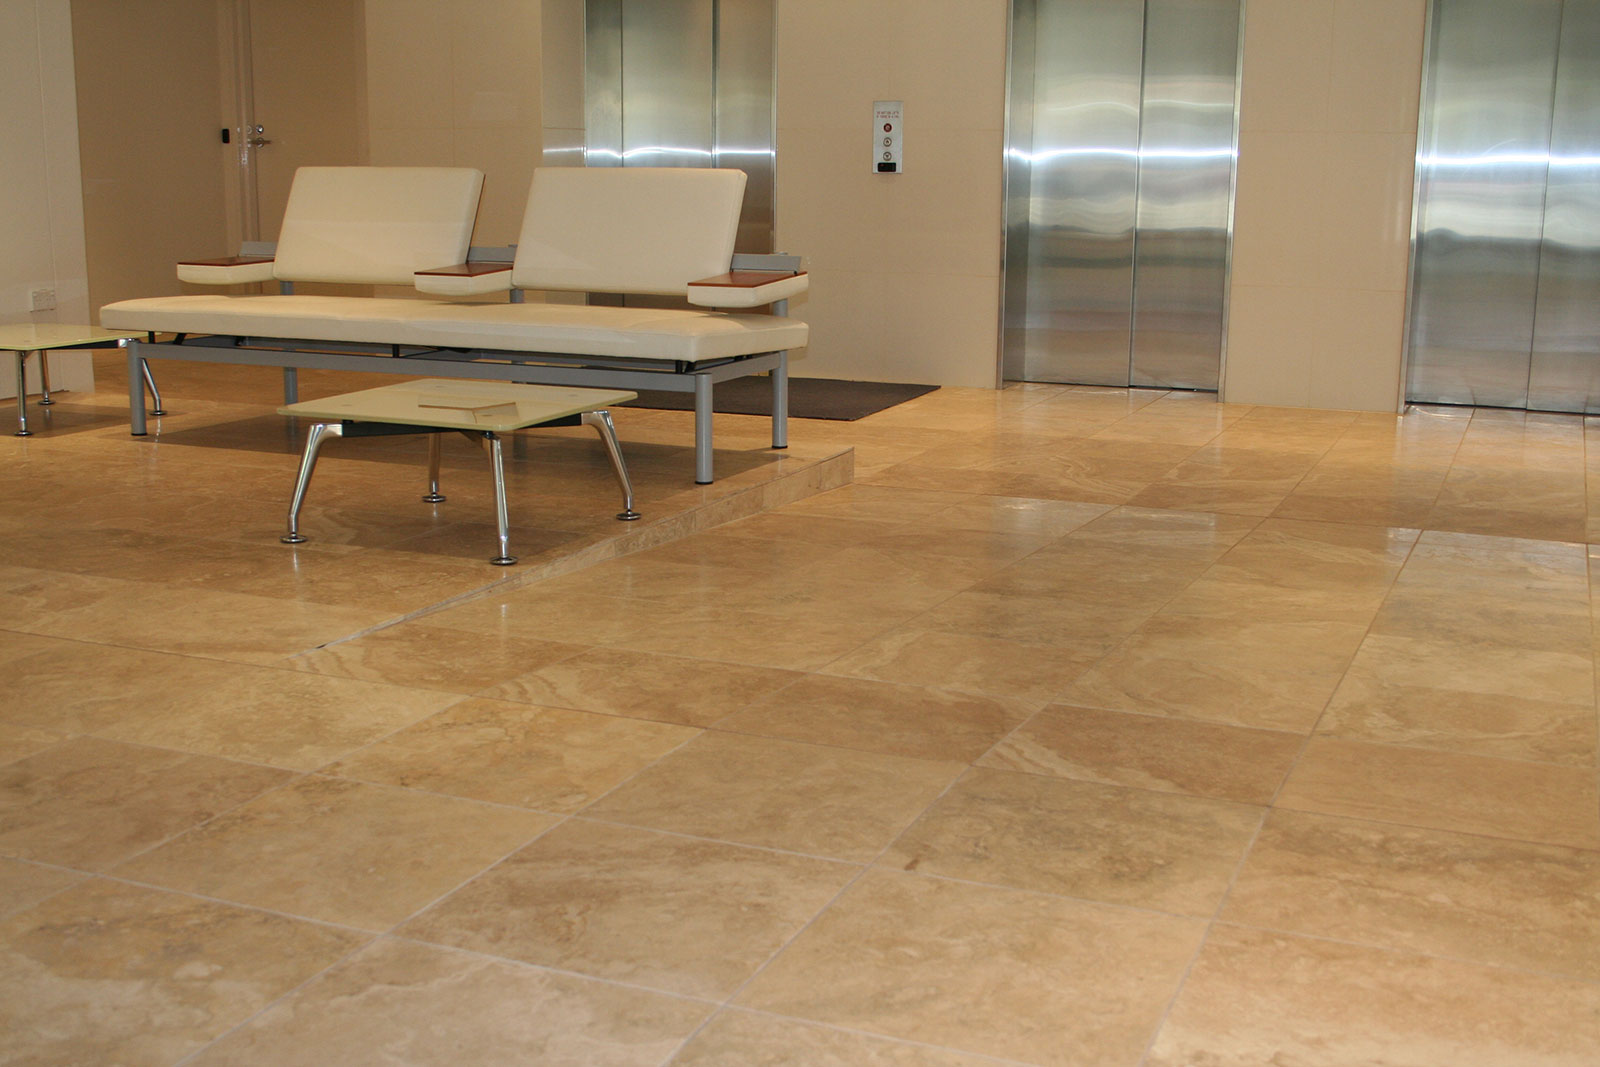 Floor tiler perth floor tiling austrend perth floor tiler dailygadgetfo Choice Image